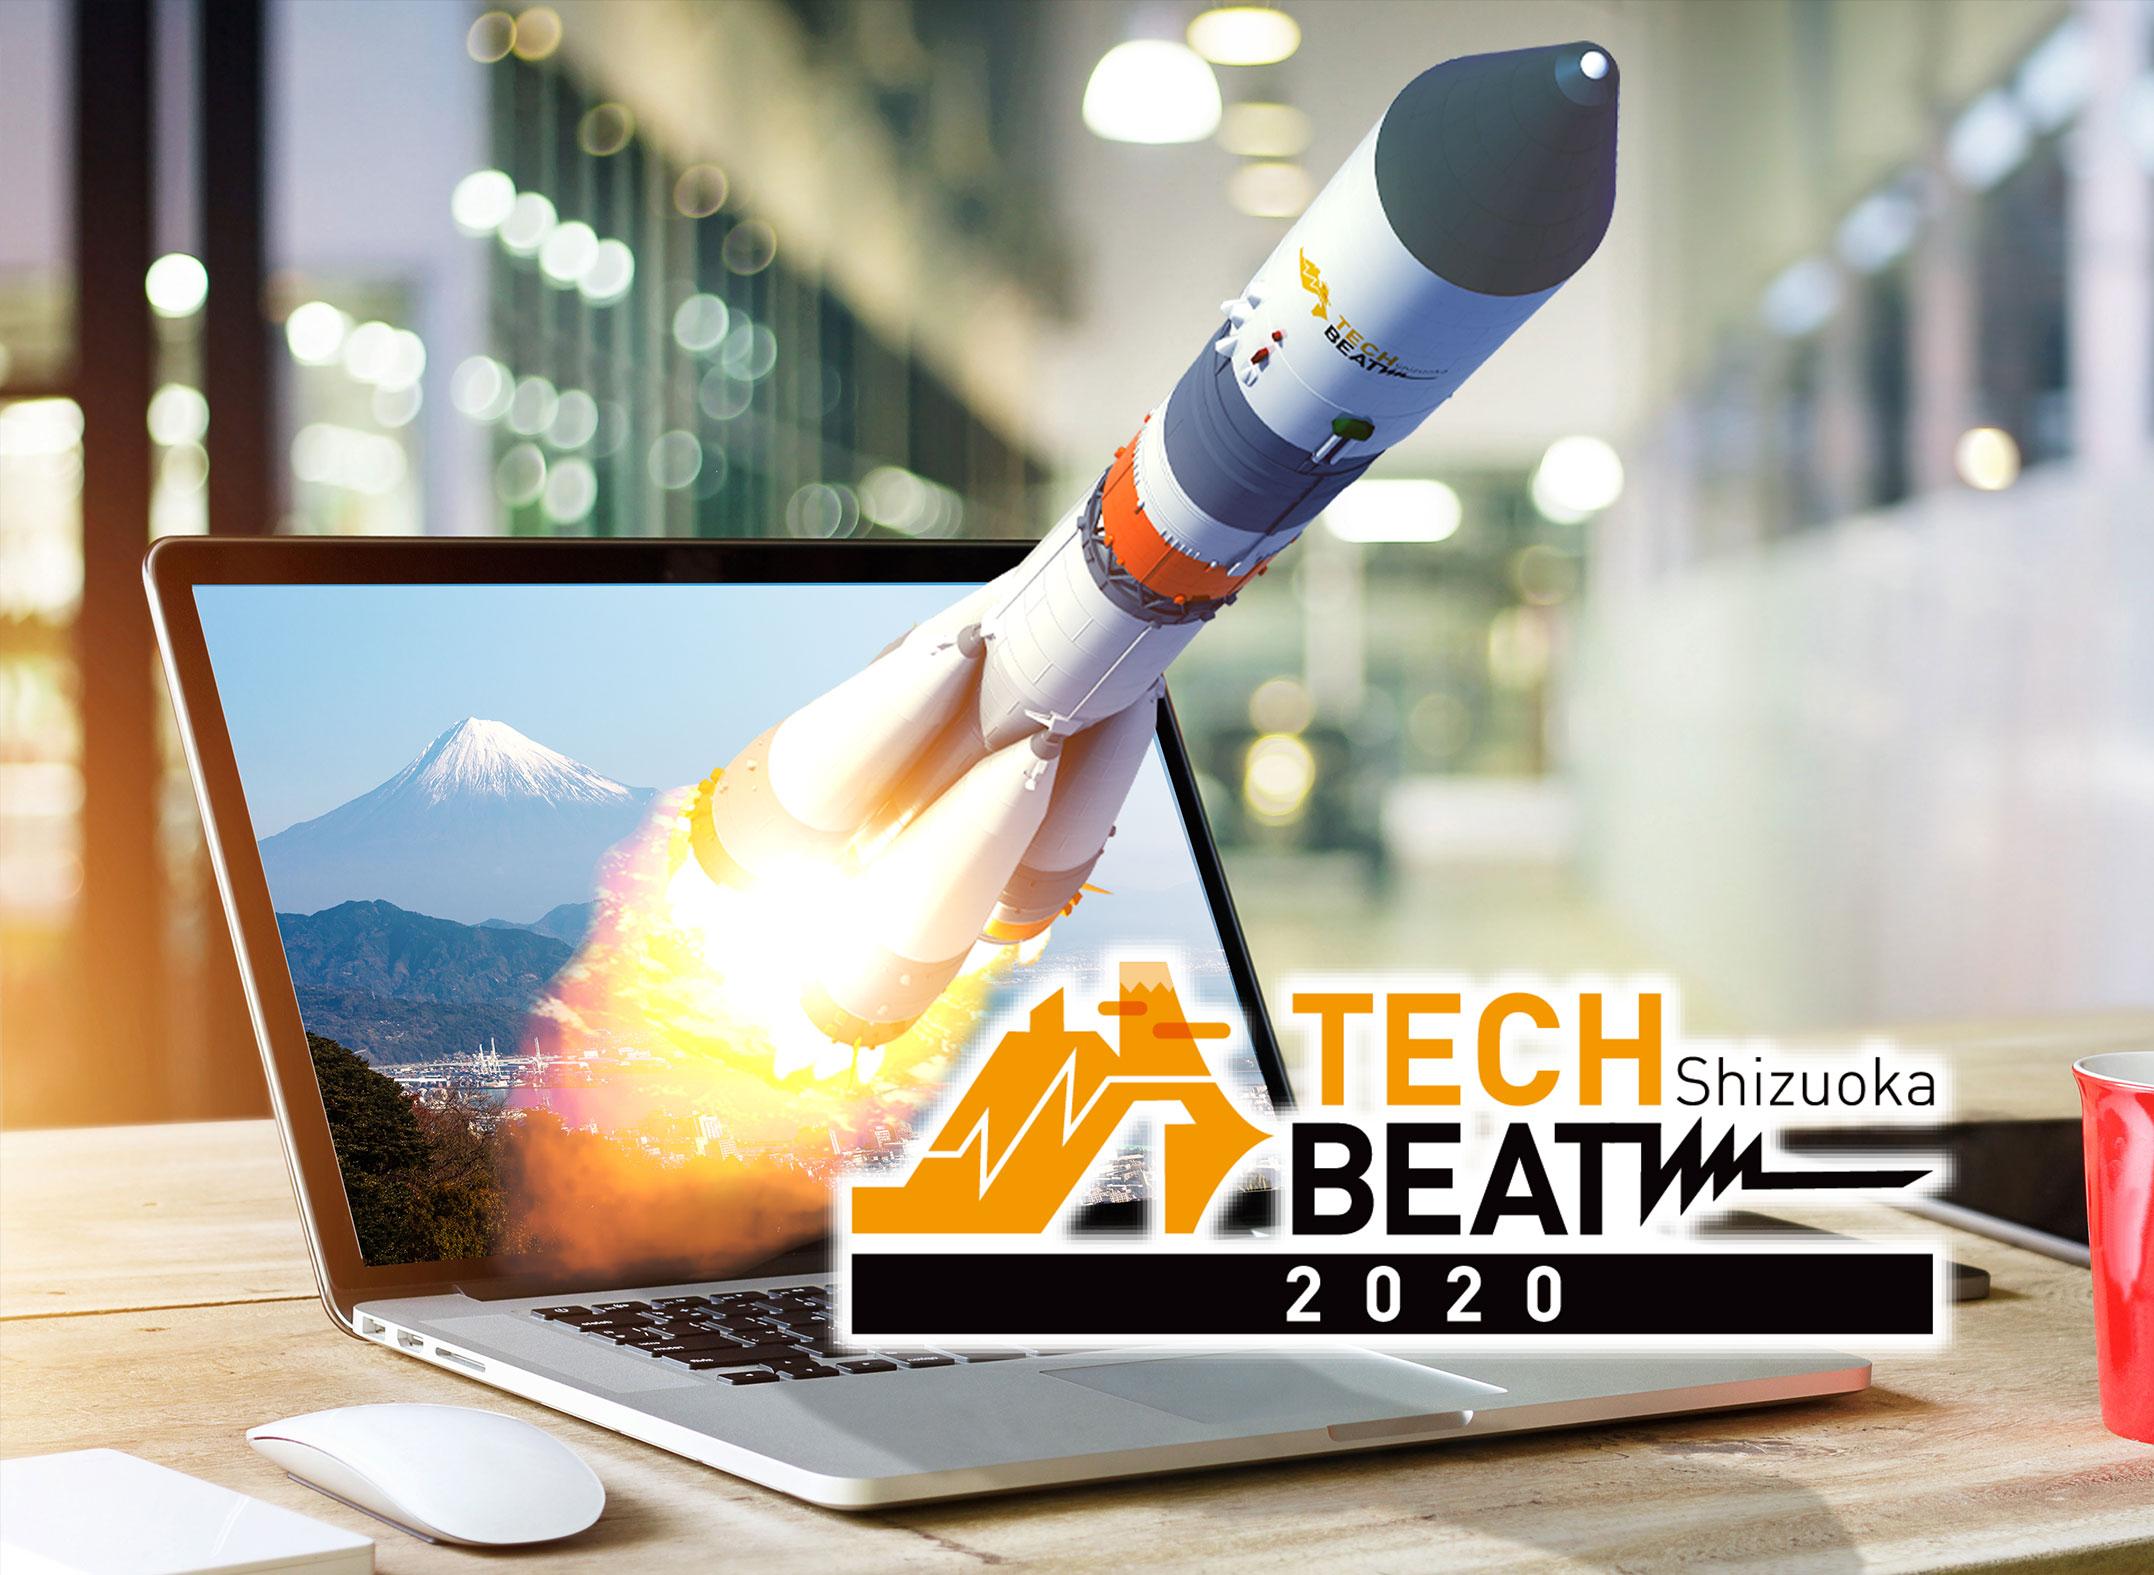 TECH BEAT Shizuoka 2020 - TECH BEAT Shizuoka Online